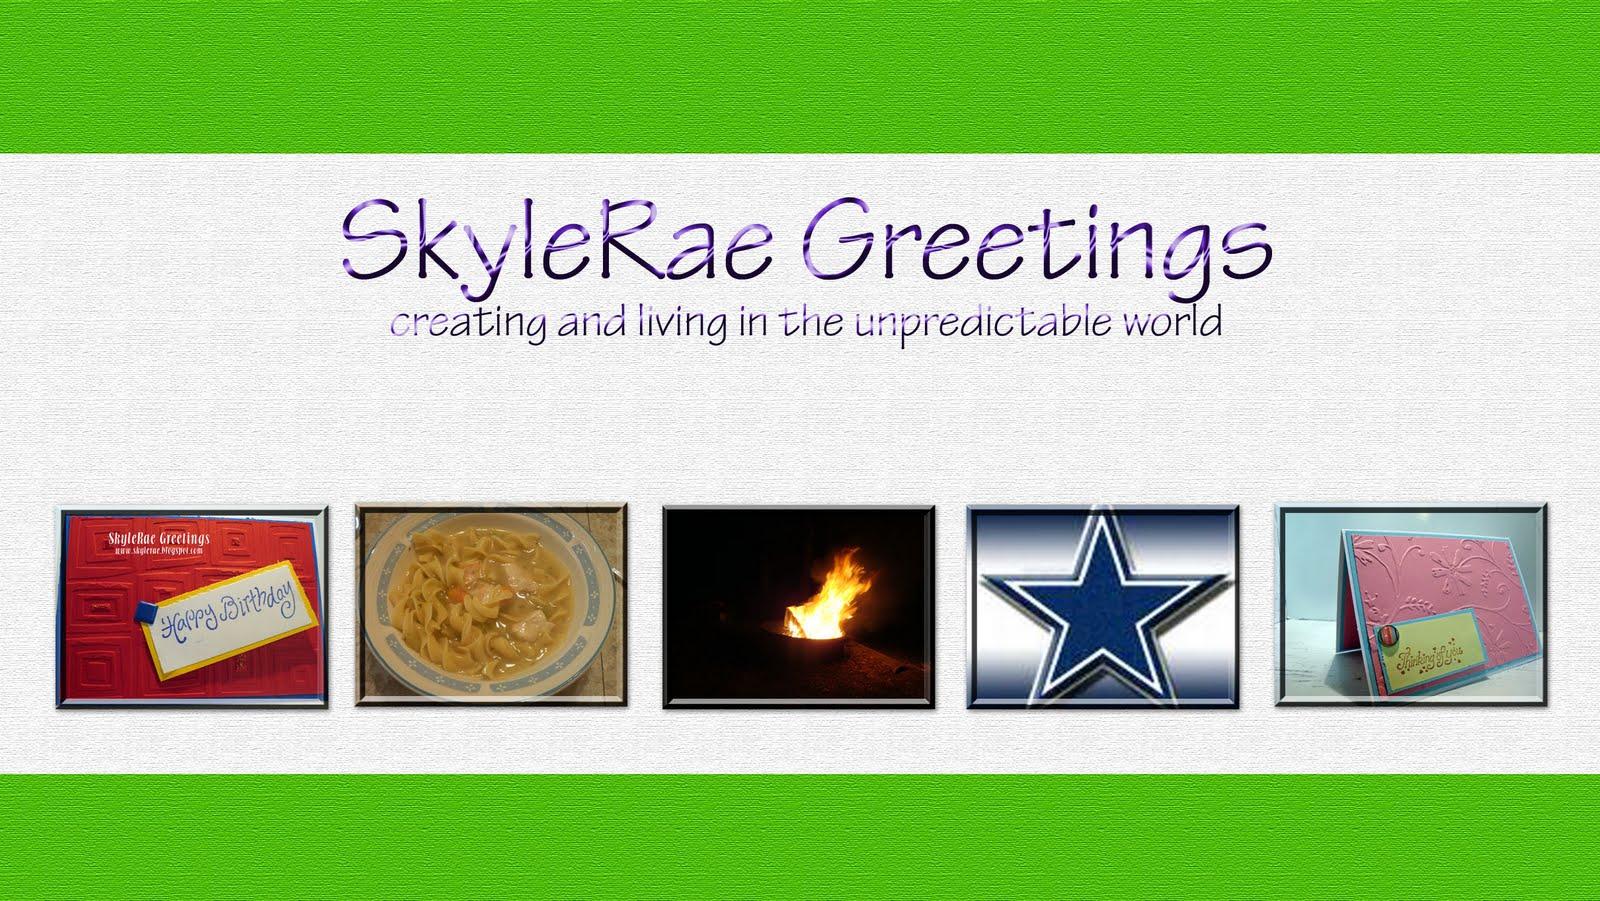 SkyleRae's